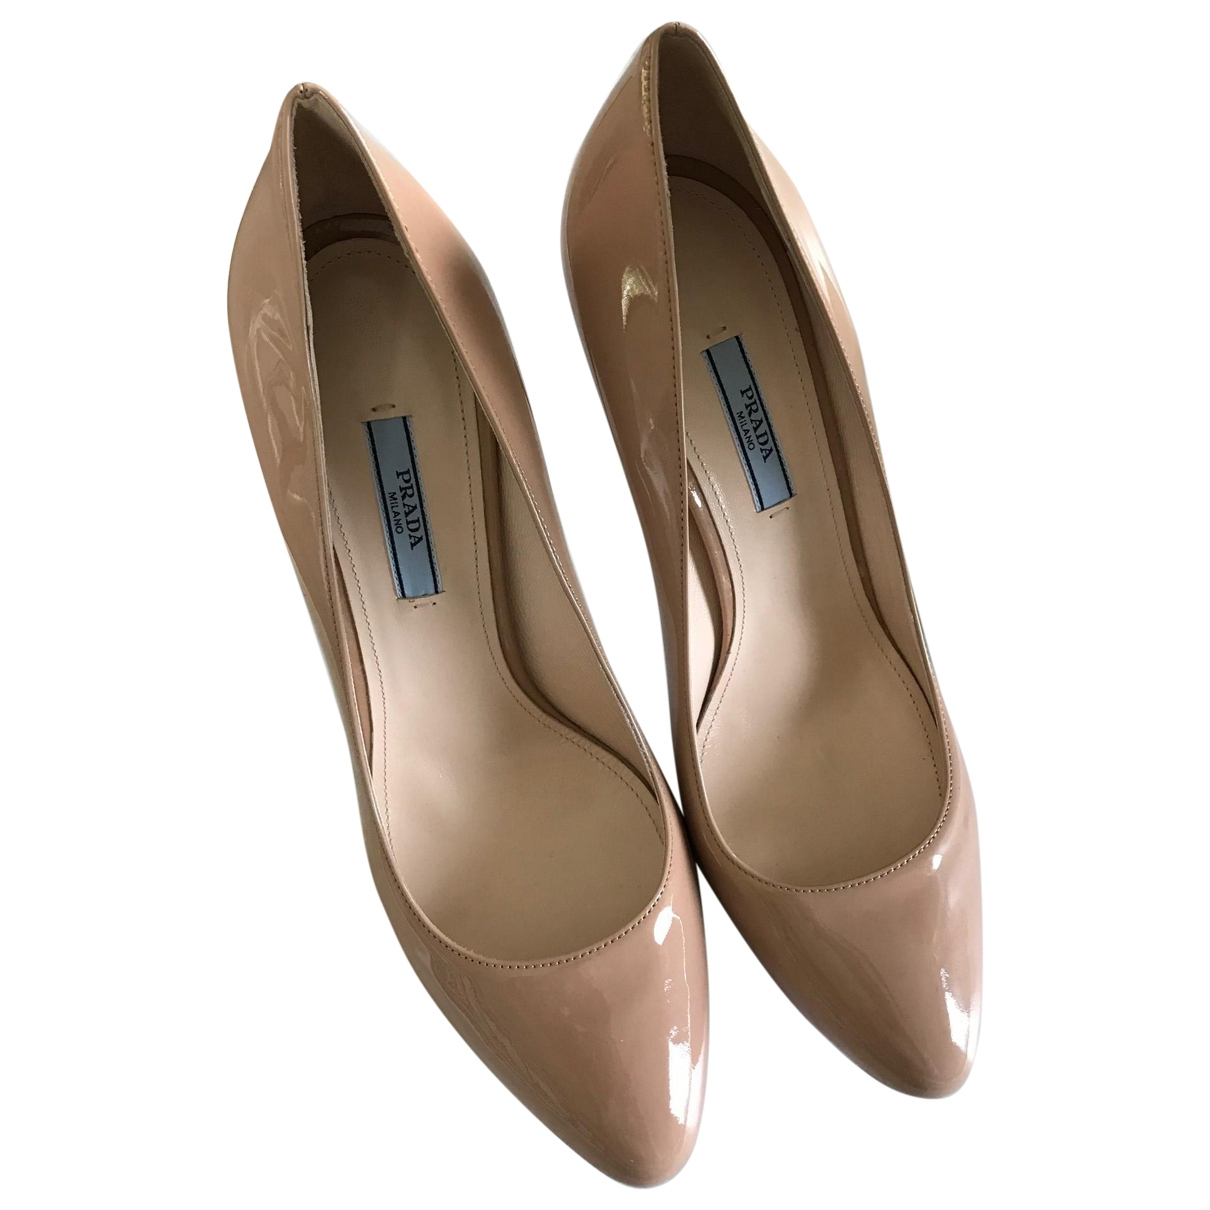 Prada \N Pink Patent leather Heels for Women 39.5 EU